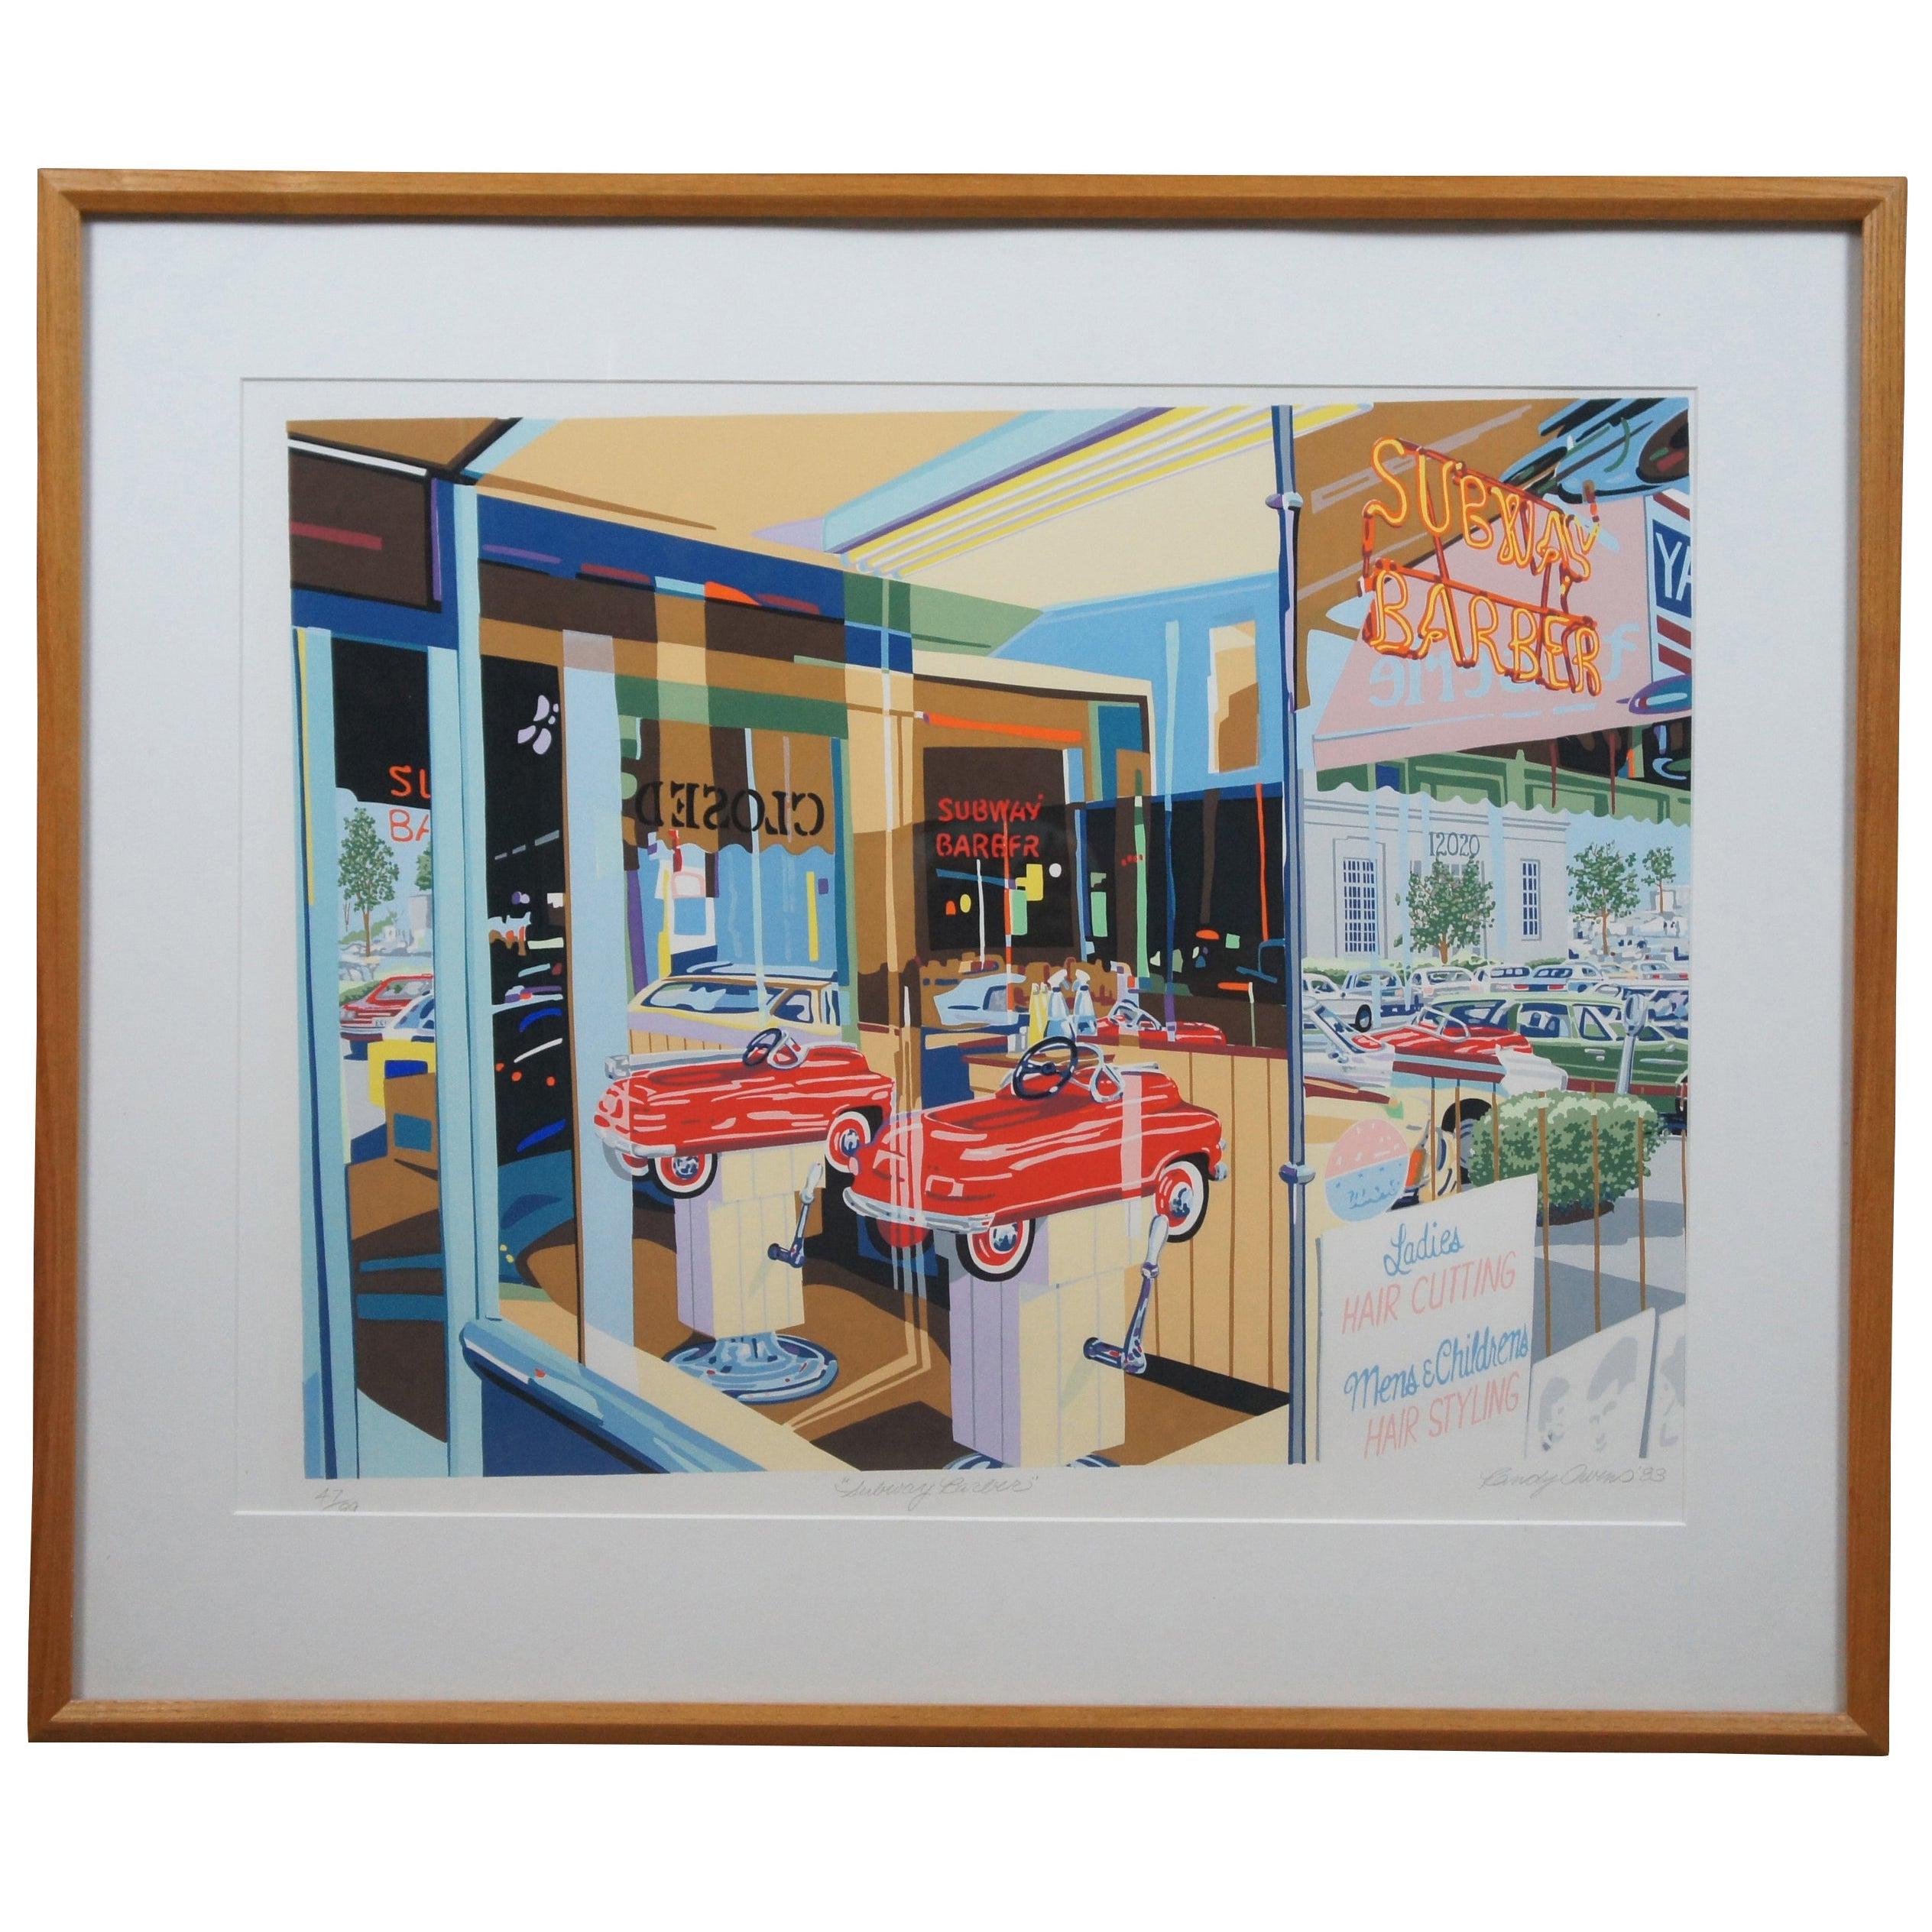 1983 Randy Owens Pencil Signed Subway Barber Serigraph Print